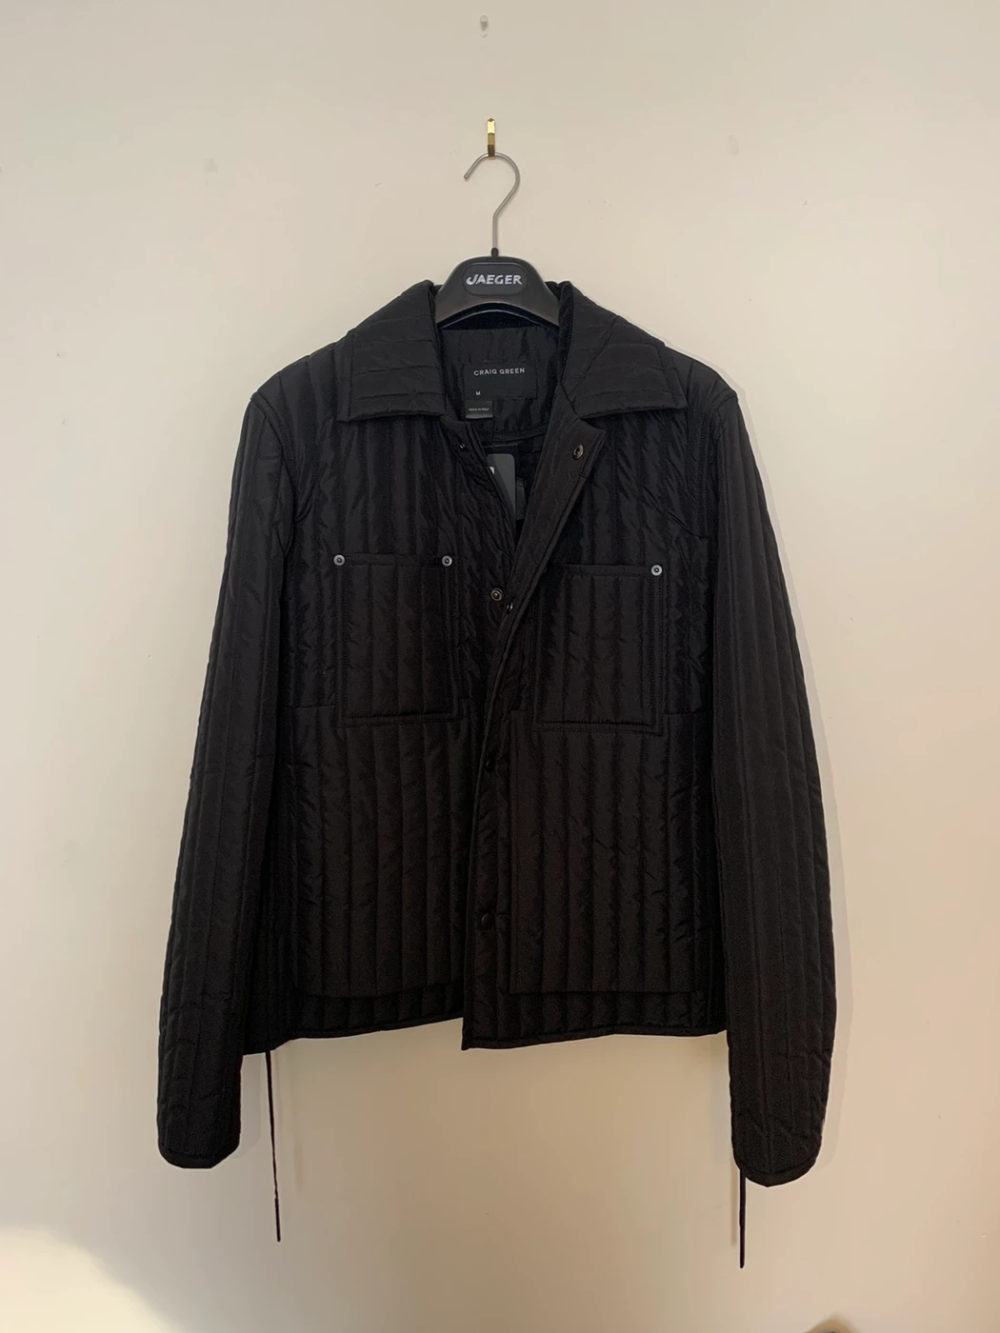 Craig Green Ss19 Craig Green Black Quilted Worker Jacket Size M 688 Green Outerwear Black Quilt Jackets